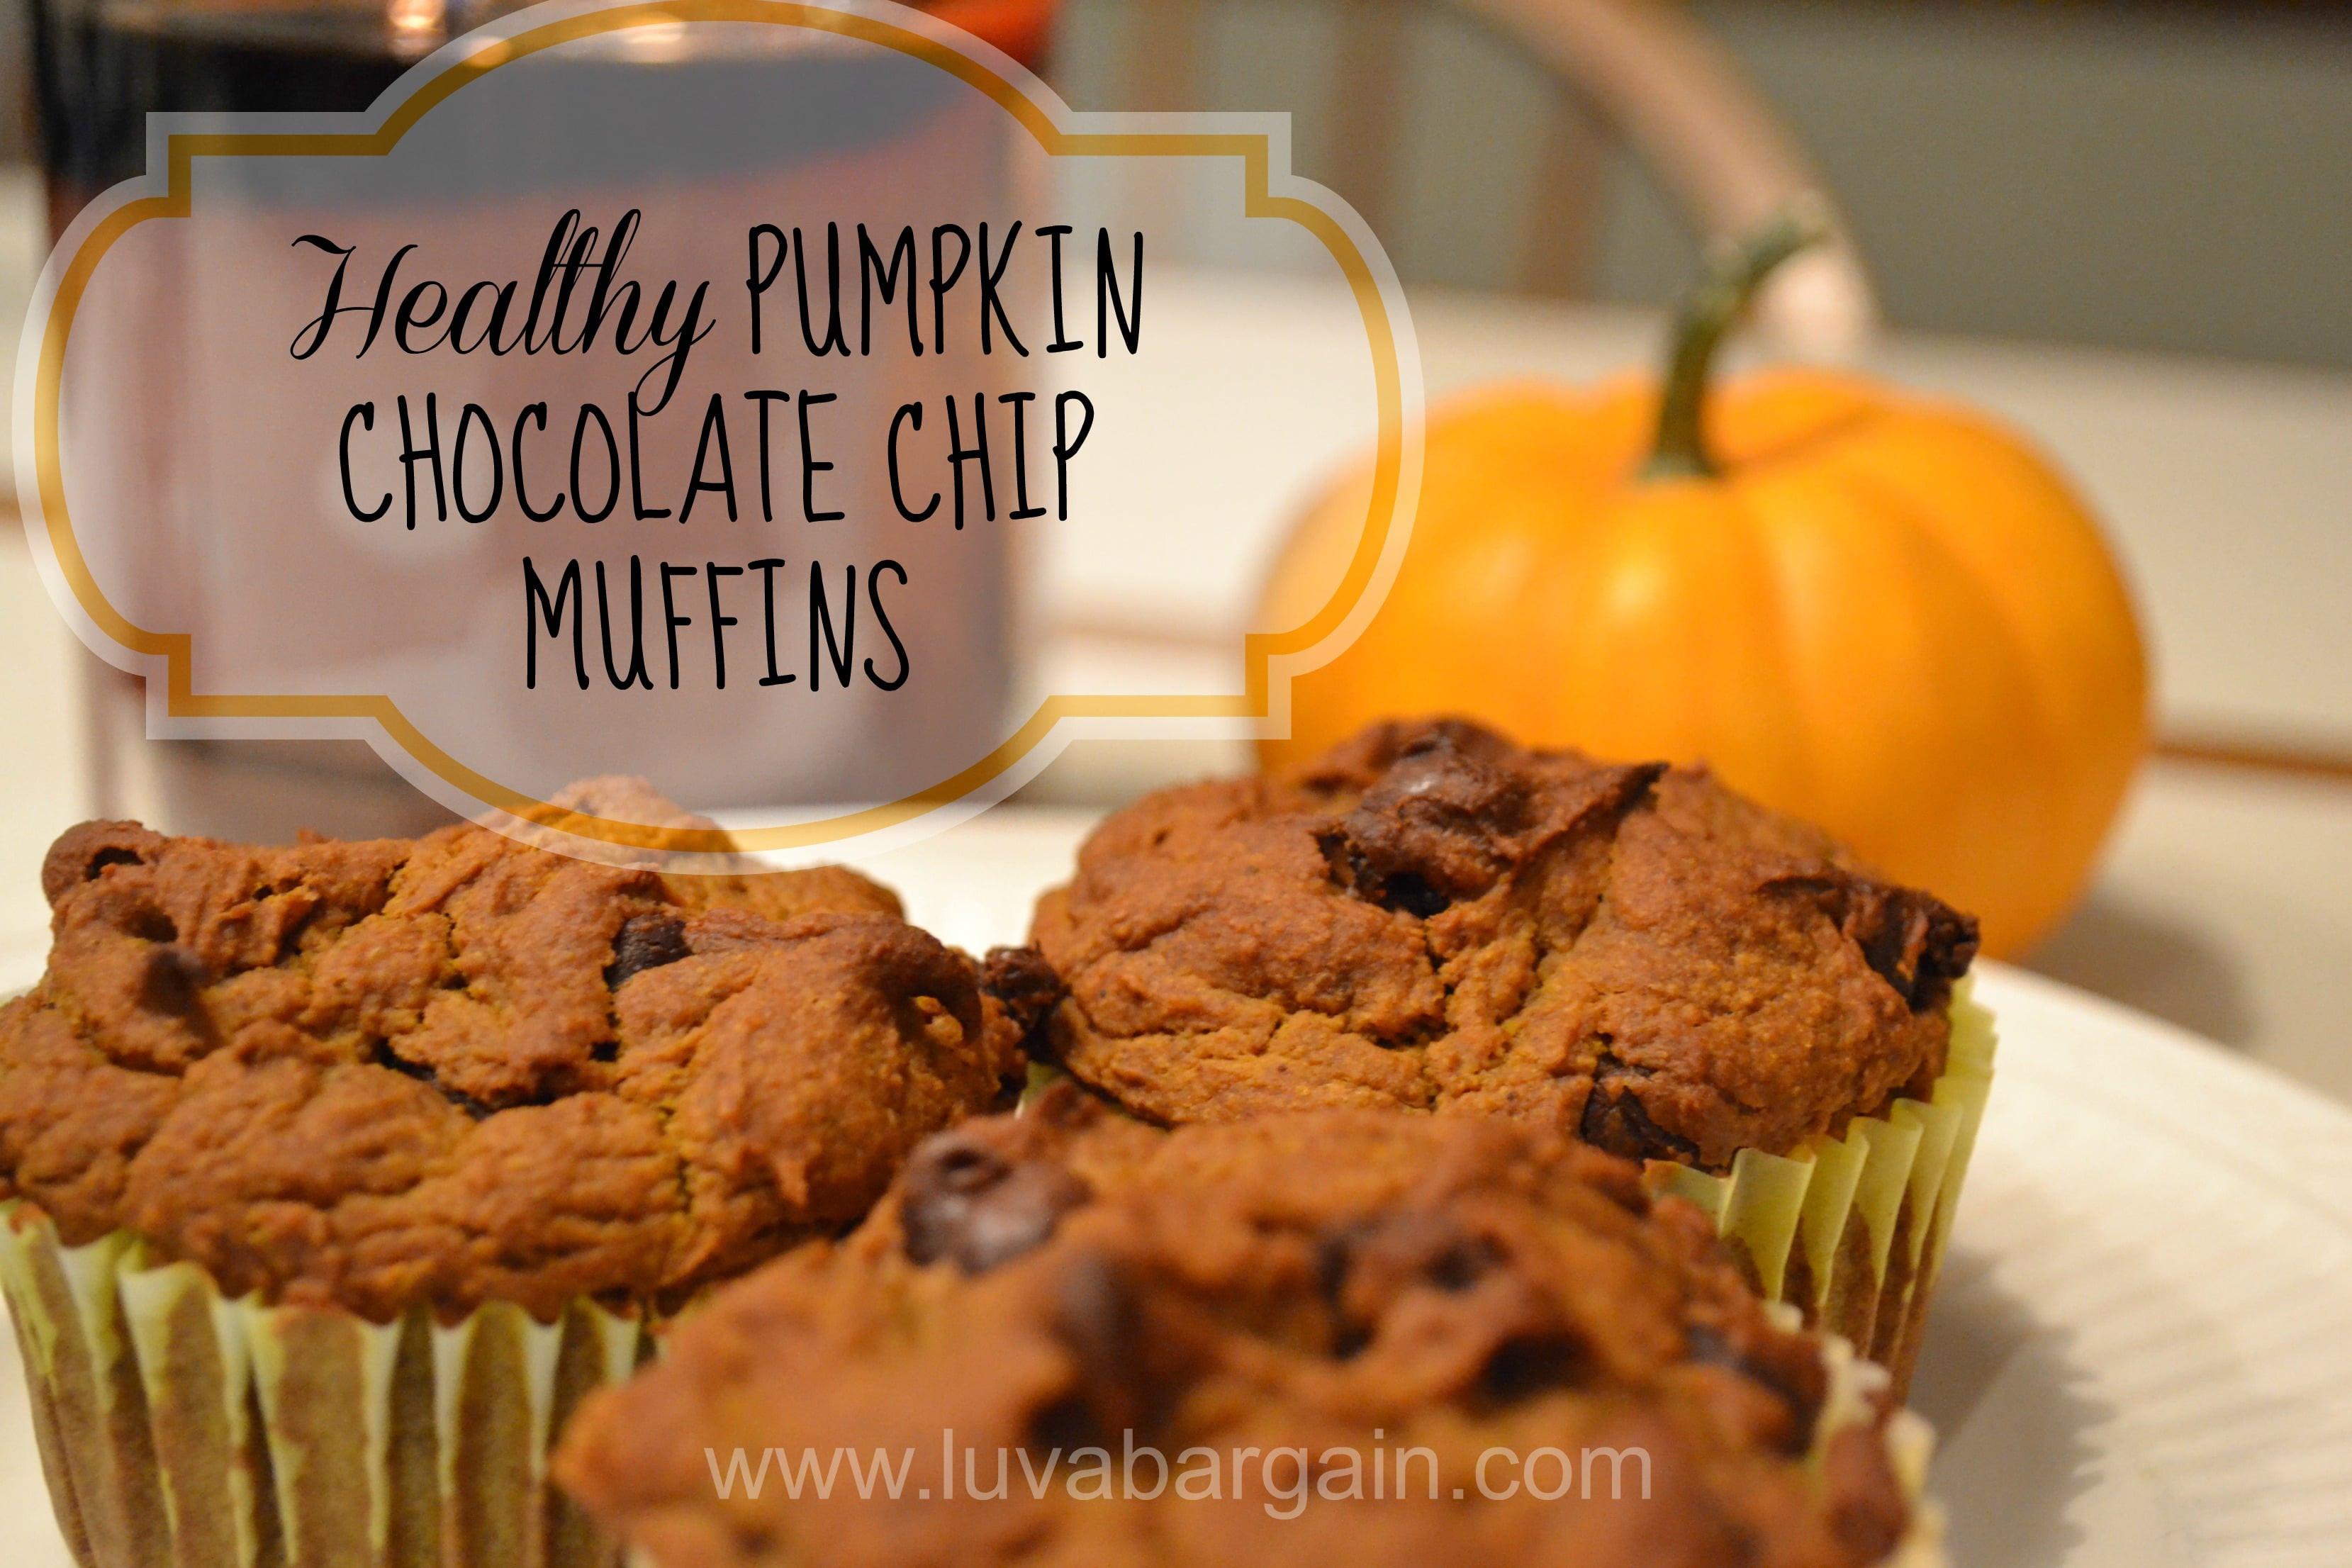 Healthy Chocolate Muffins  Healthy Pumpkin Chocolate Chip Muffins